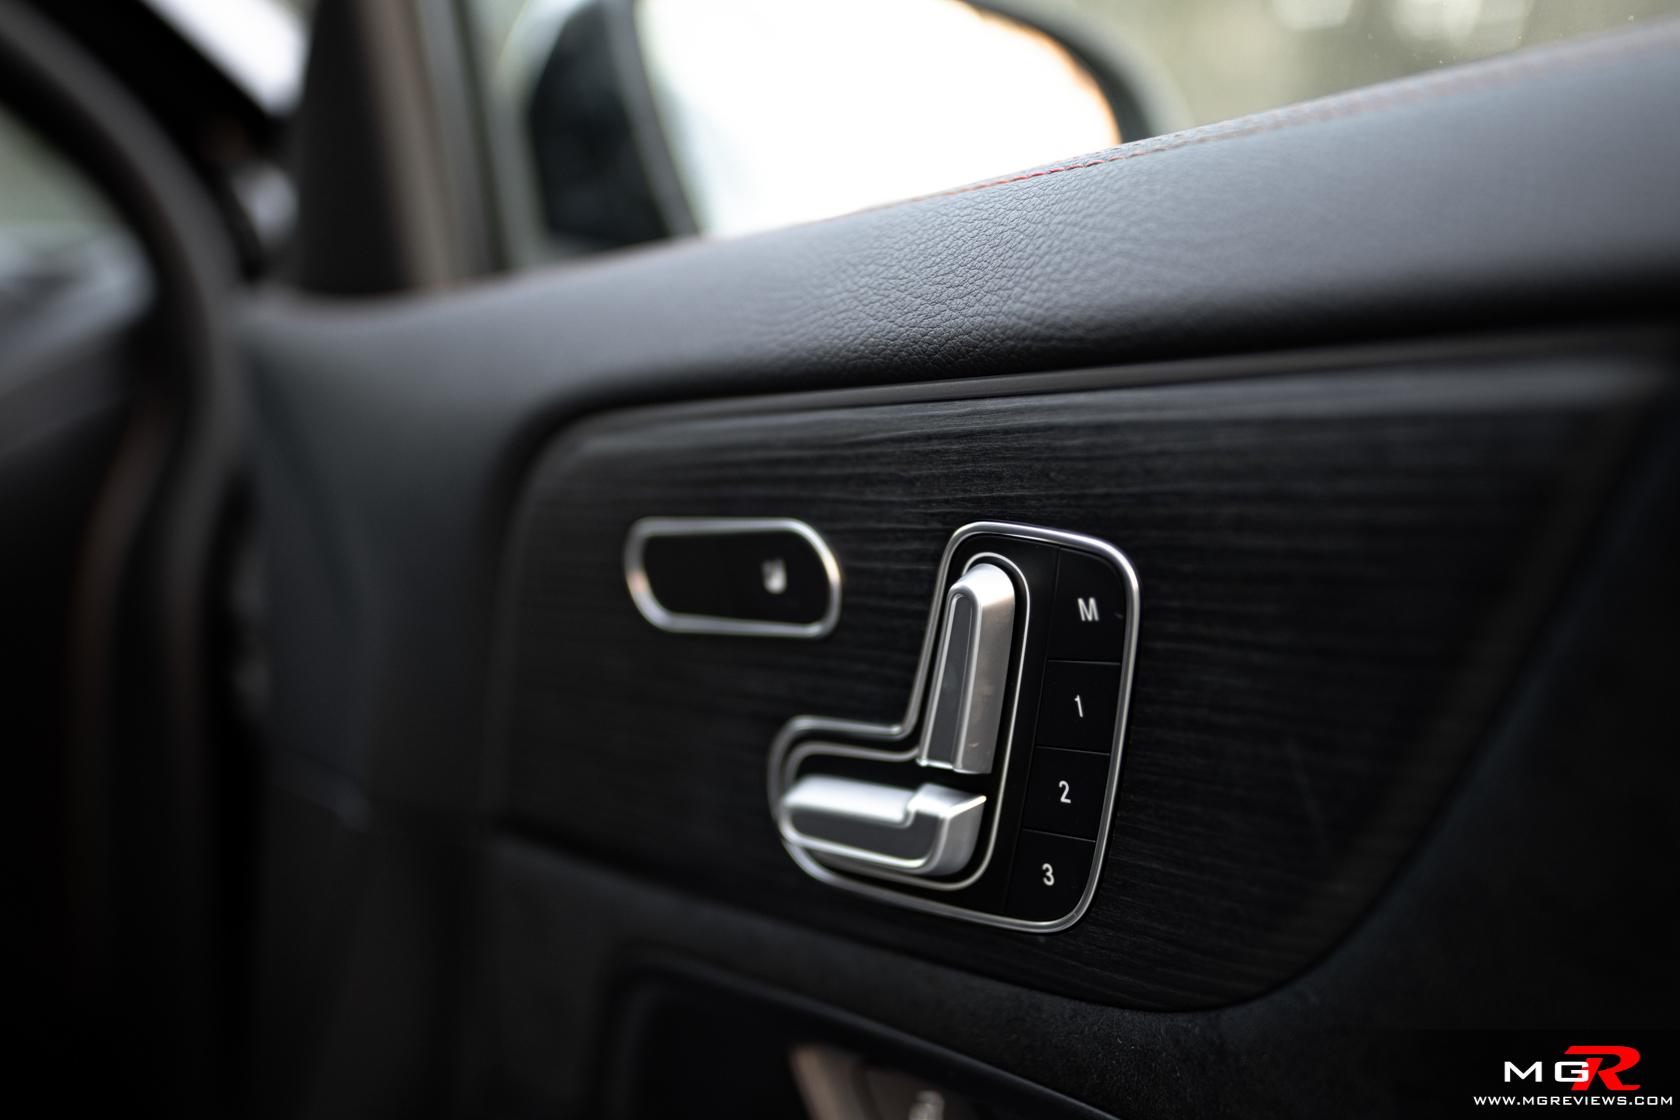 2021 Mercedes-Benz GLA 45 AMG Interior2021 Mercedes-Benz GLA 45 AMG Interior